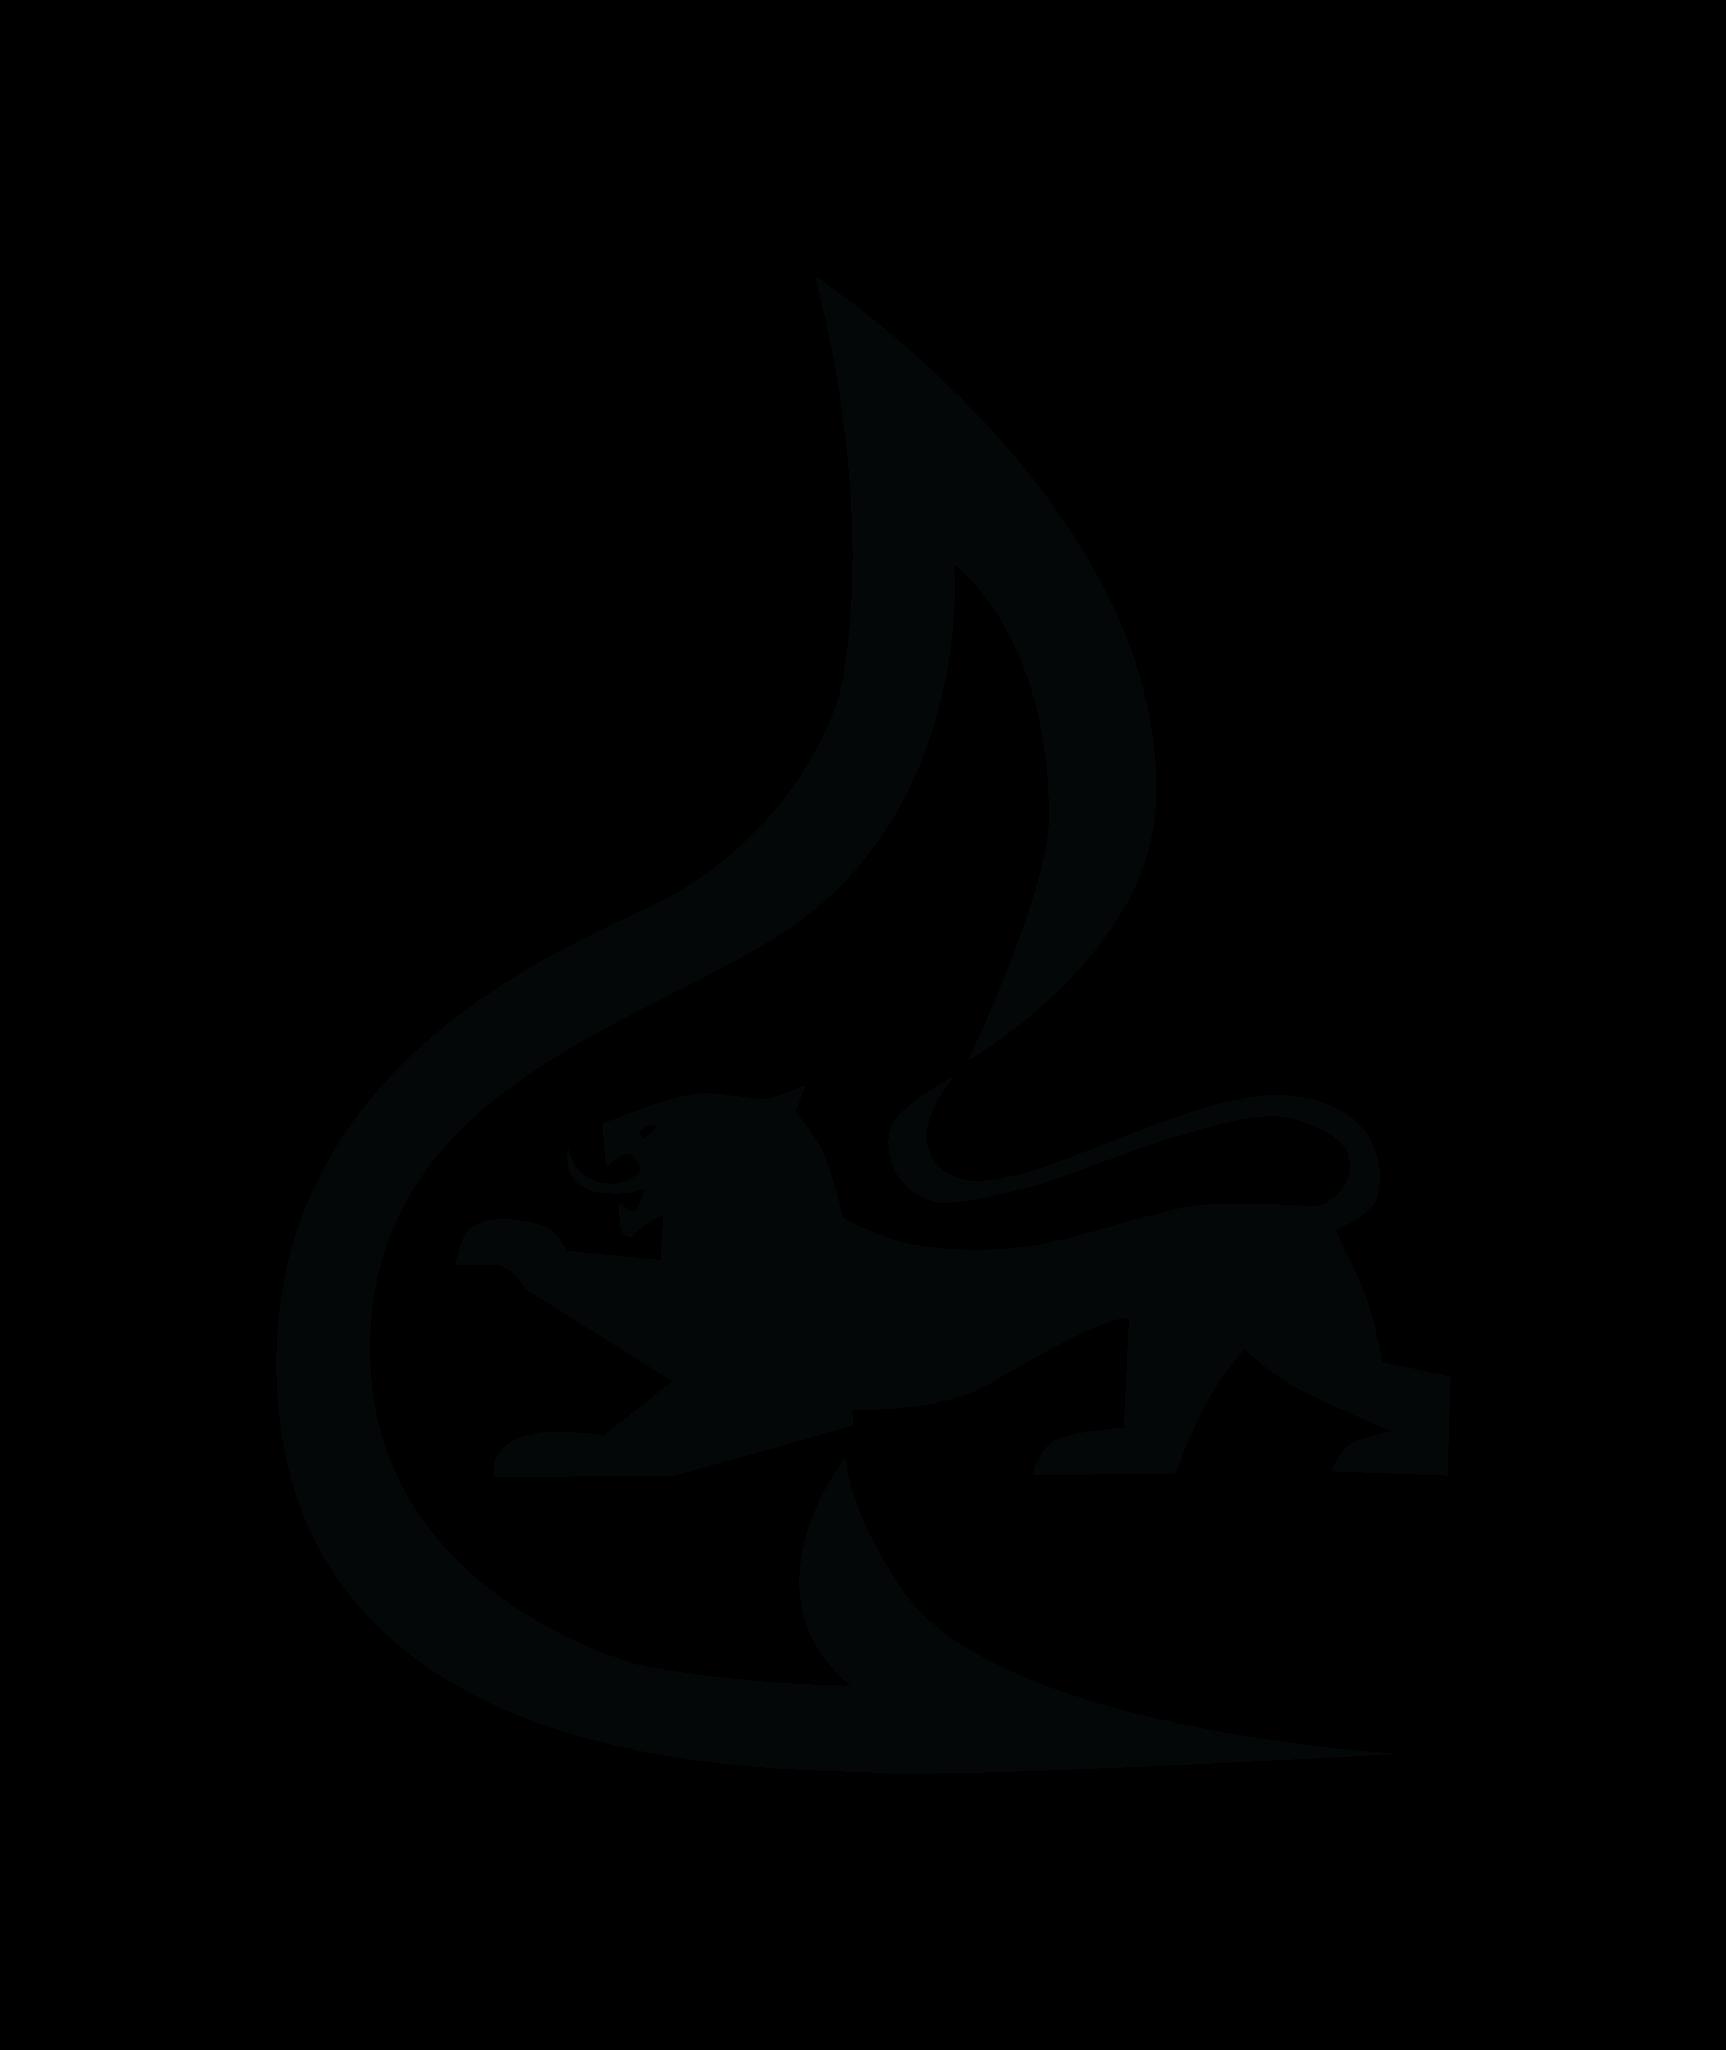 Signet Landesfeuerwehrverband BW